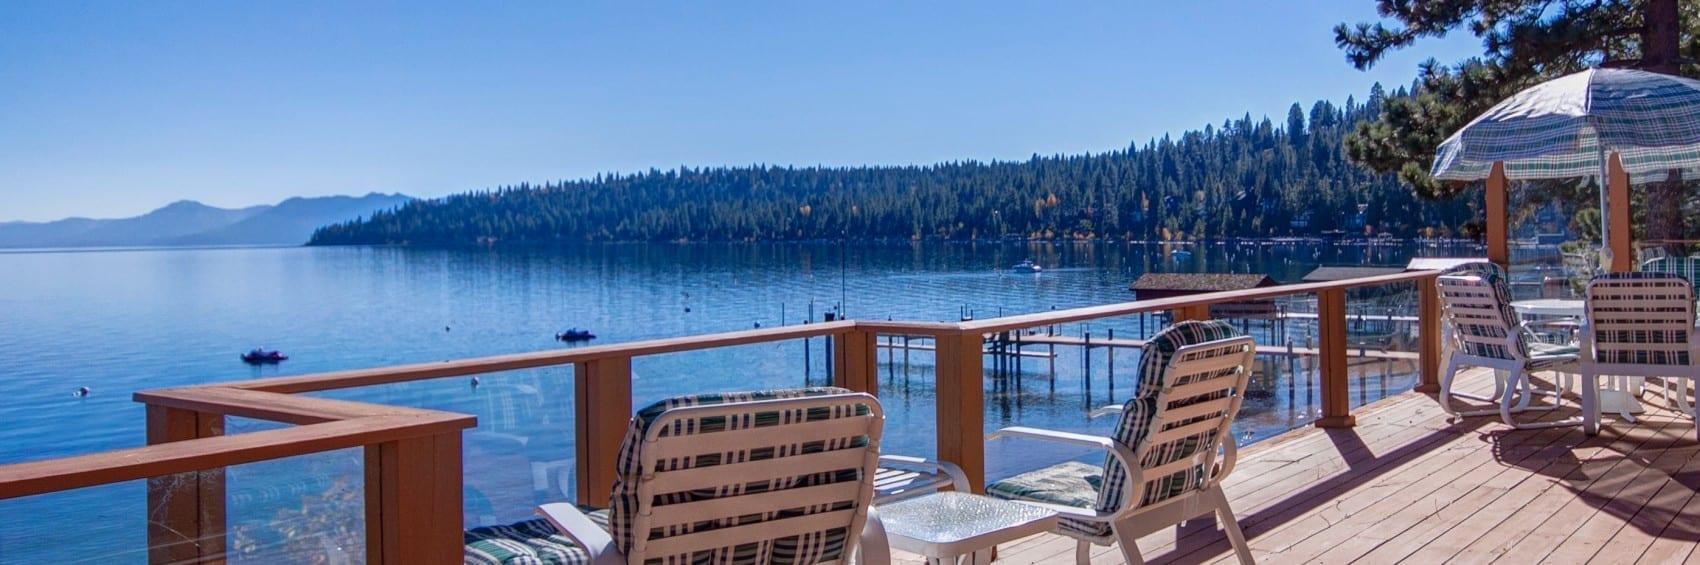 North lake tahoe vacation rentals view all properties for North lake tahoe cabin rental